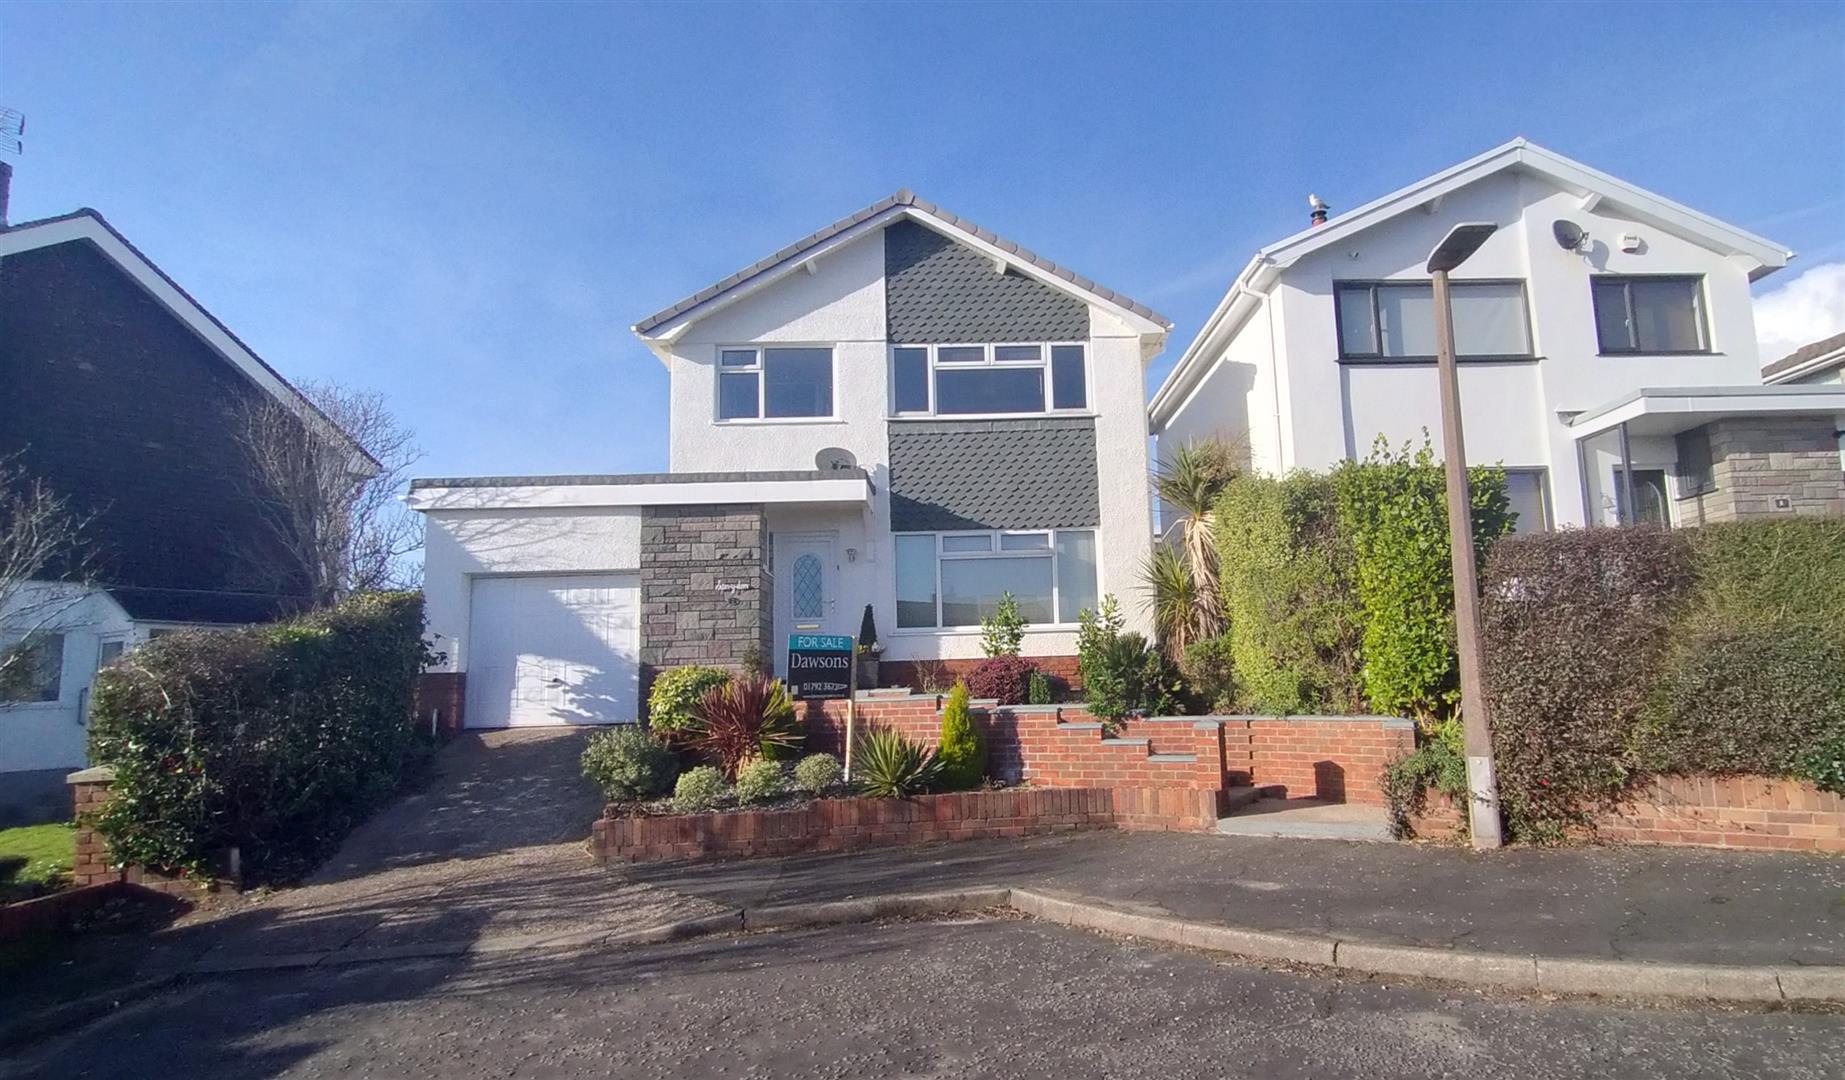 Lambswell Close, Langland, Swansea, SA3 4HJ